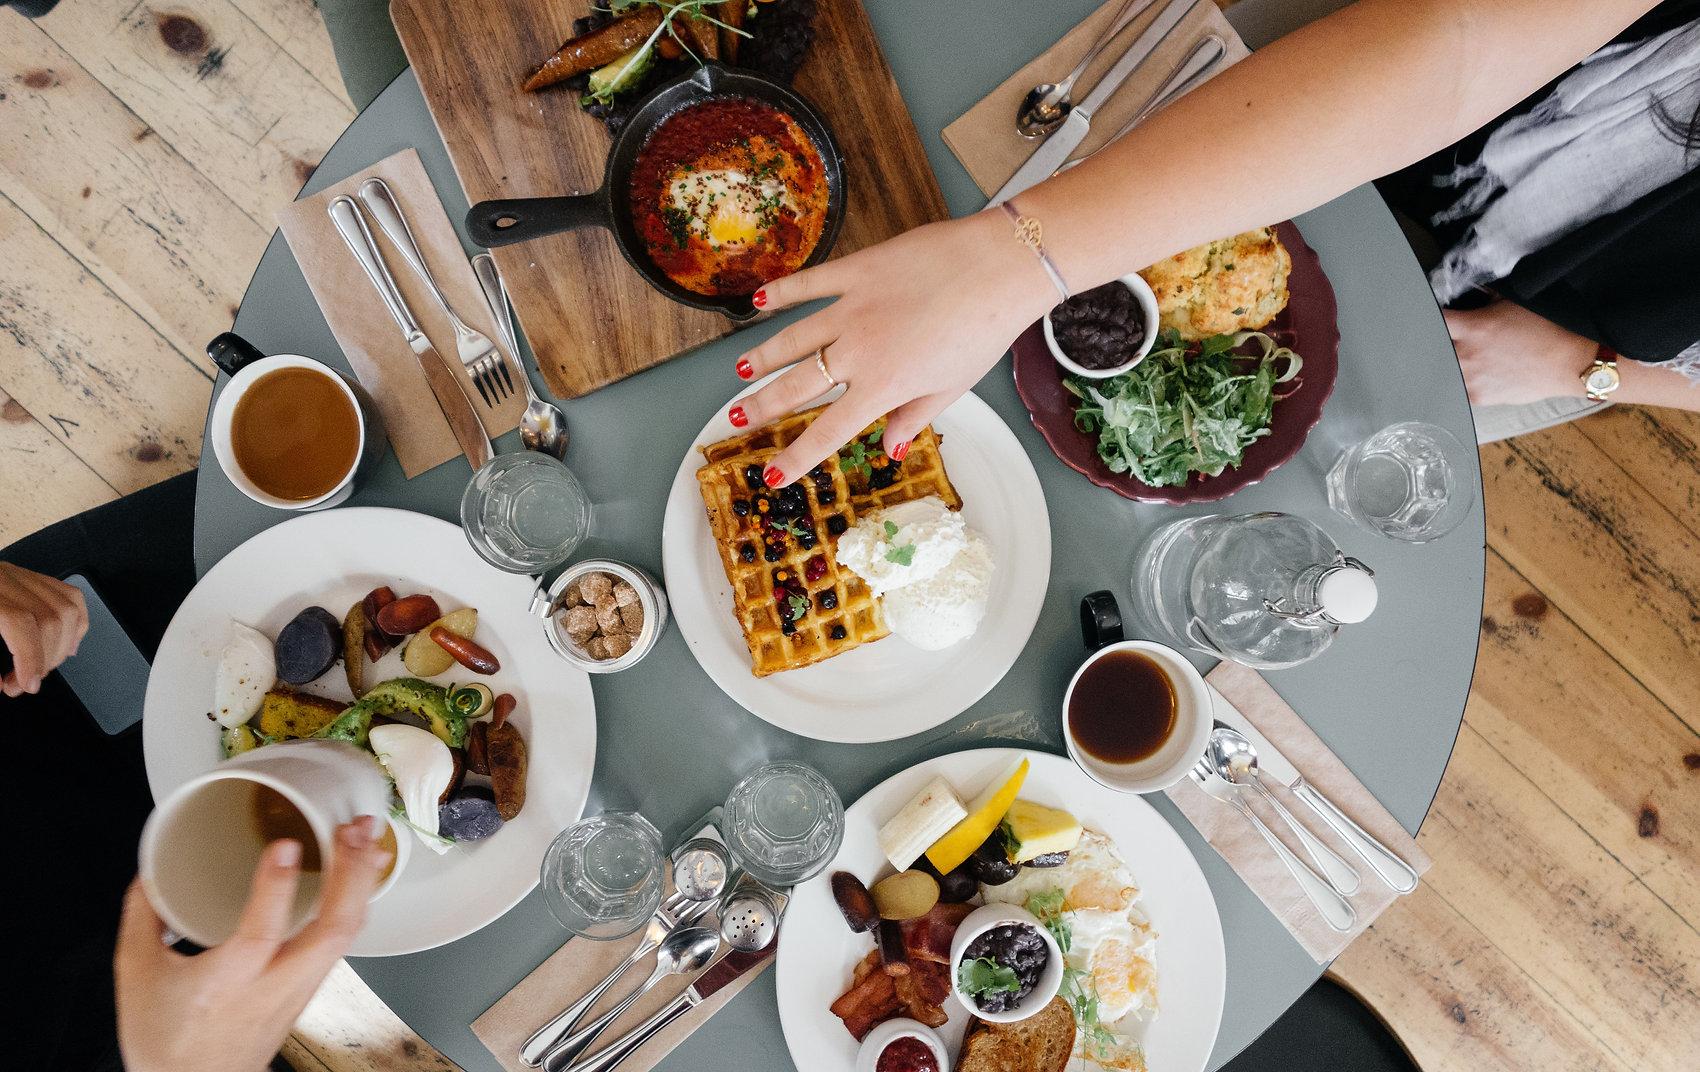 gathering-restaurant-dish-meal-food-brea